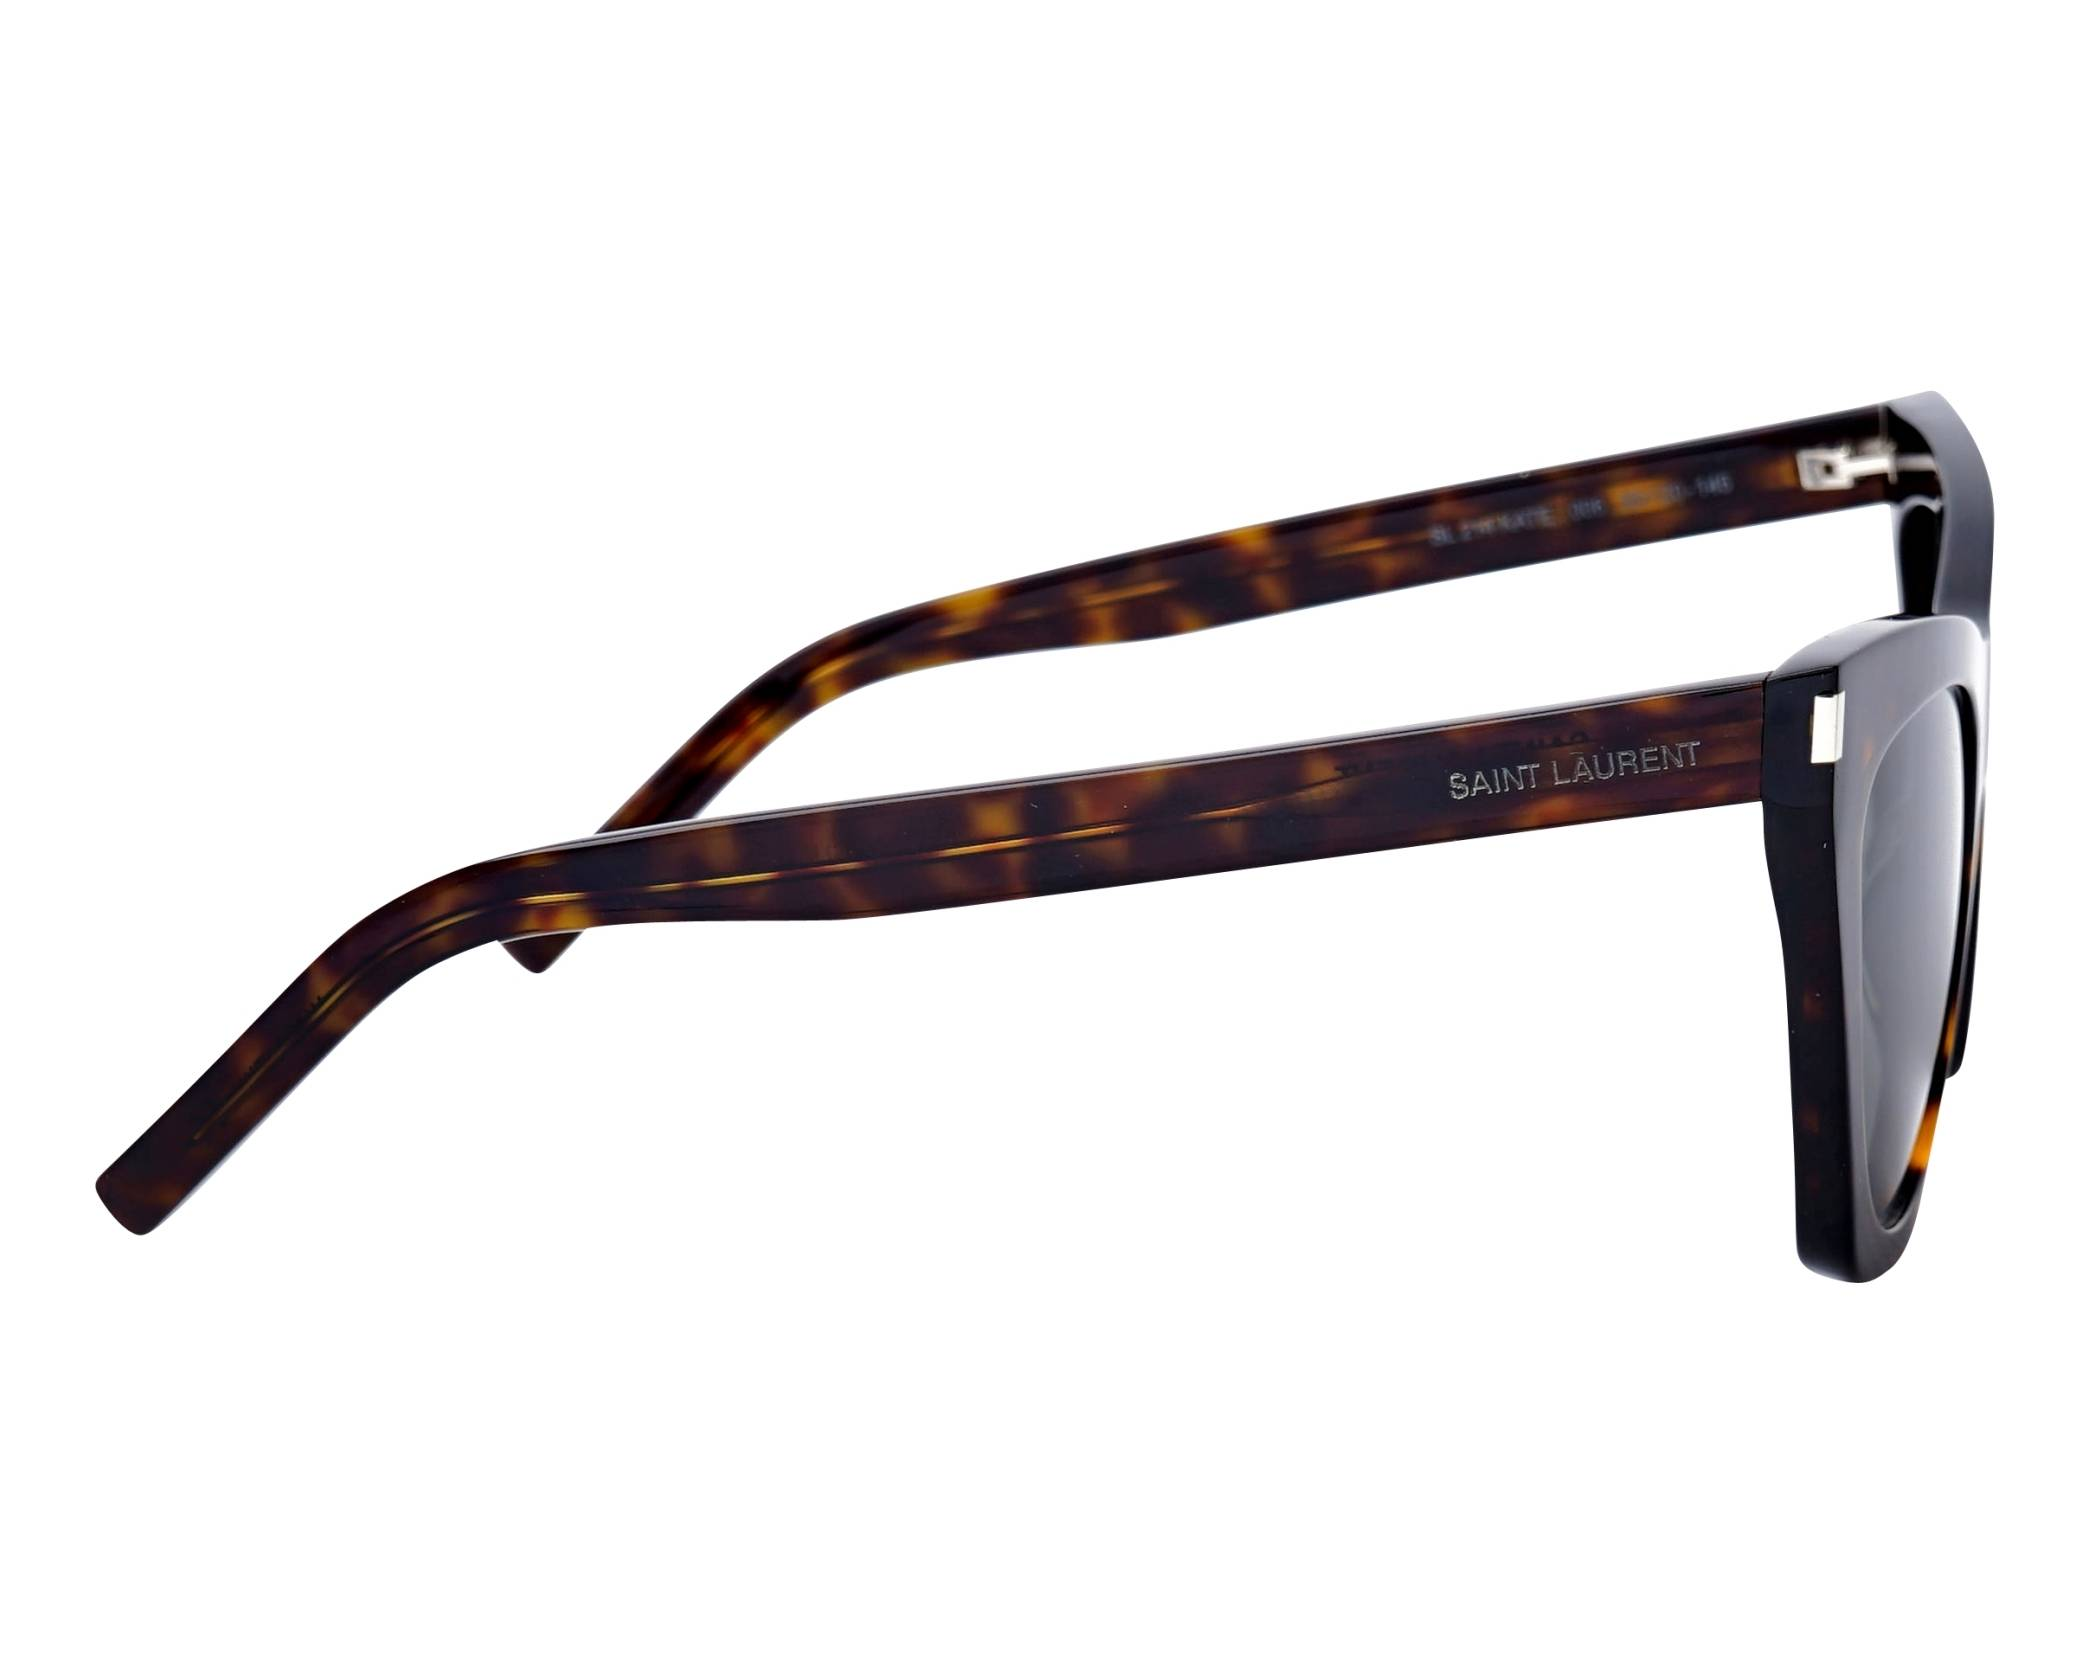 ebdd506a469 Sunglasses Yves Saint Laurent SL-214 006 55-20 Havana side view